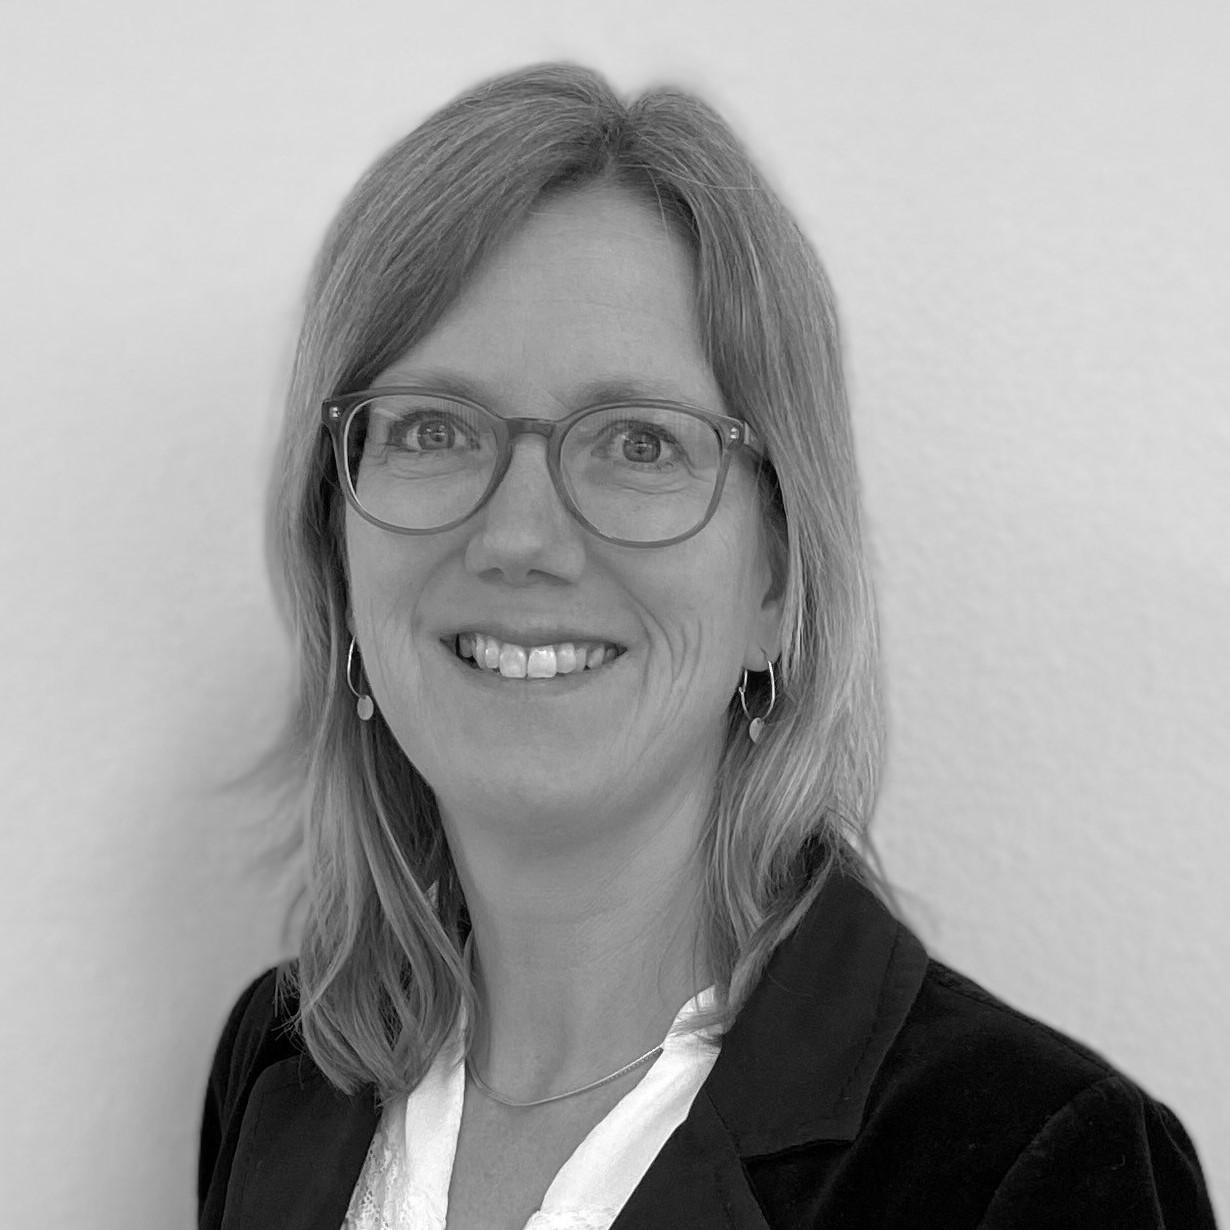 Wanda Hoogerbrugge